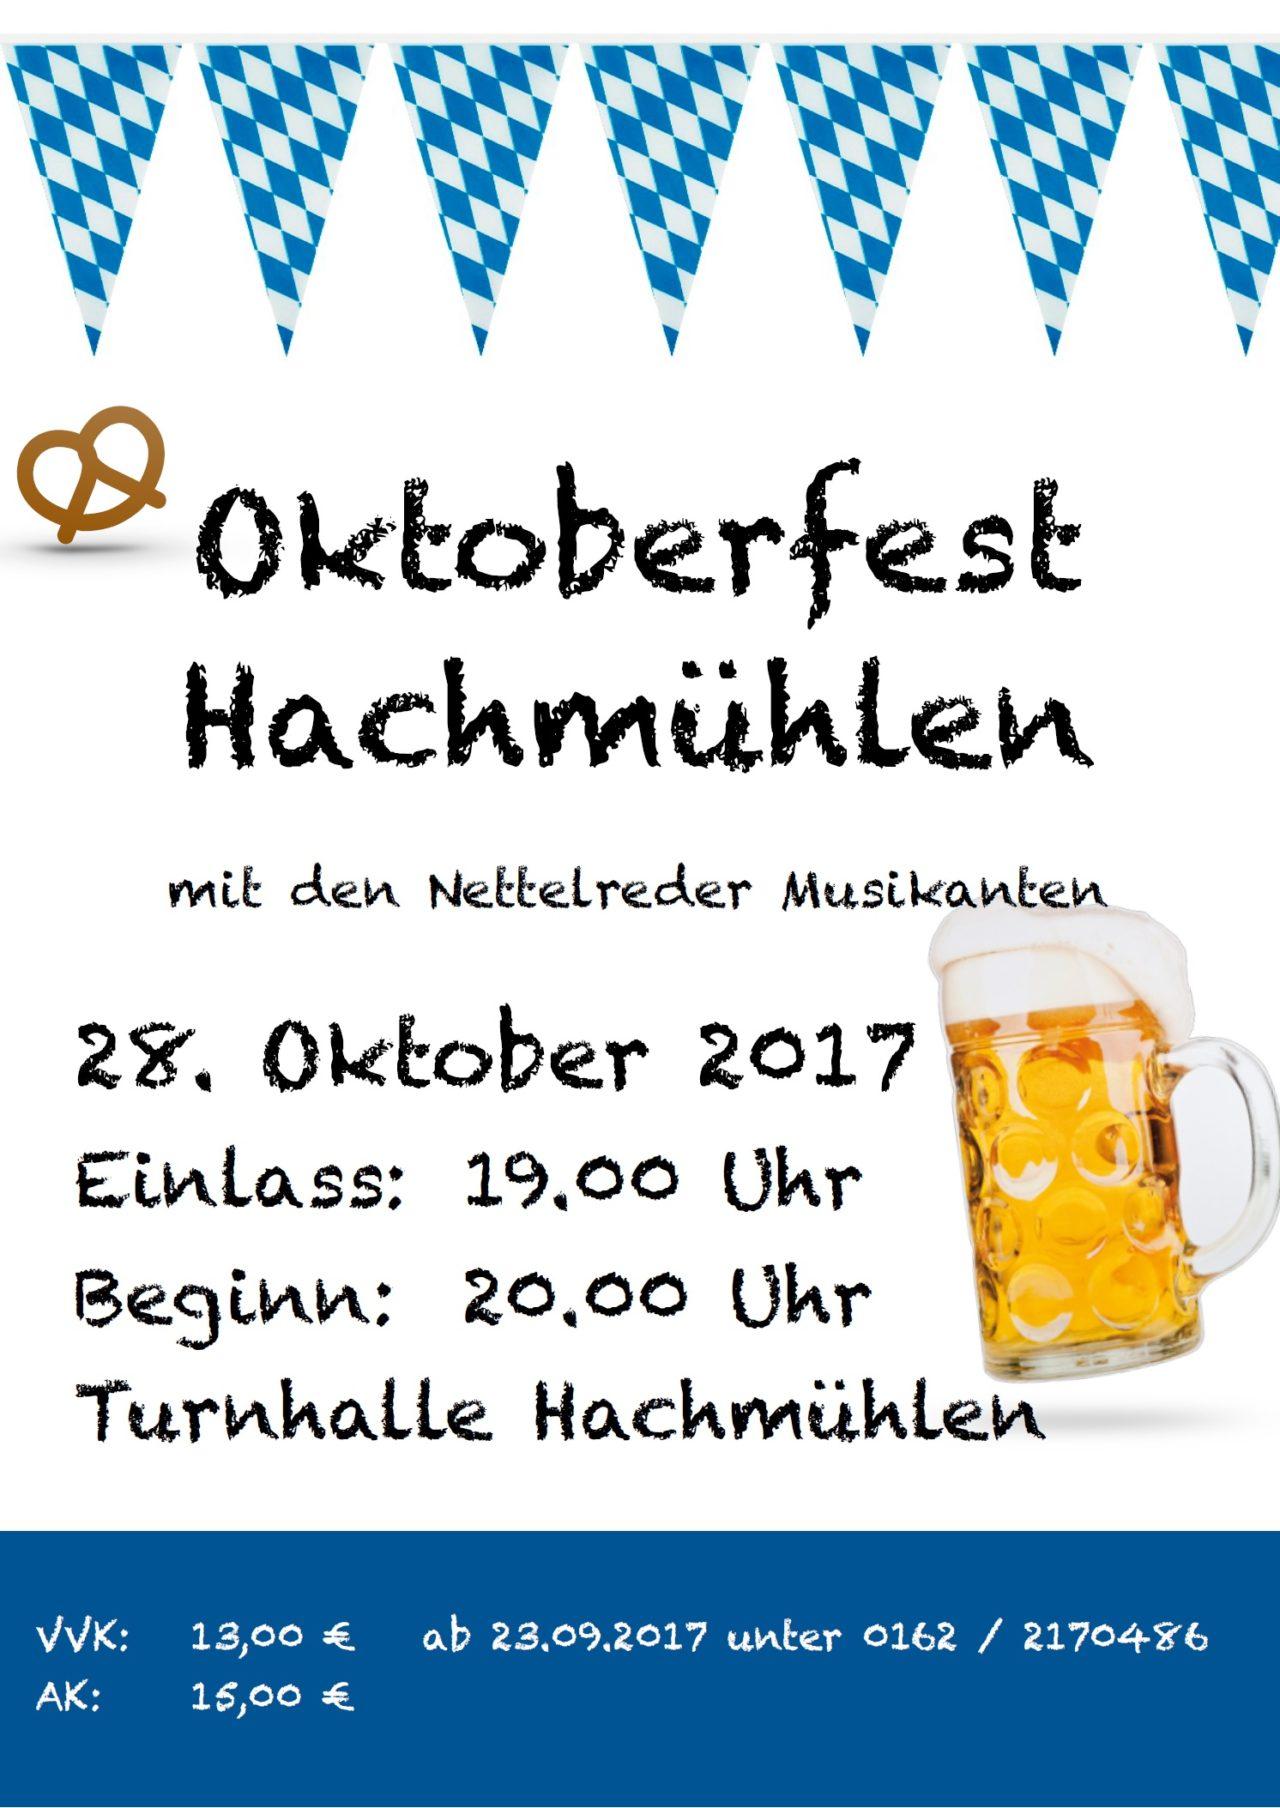 https://tsv-hachmuehlen.de/wp-content/uploads/2020/02/Oktoberfest-2017-1280x1808.jpg